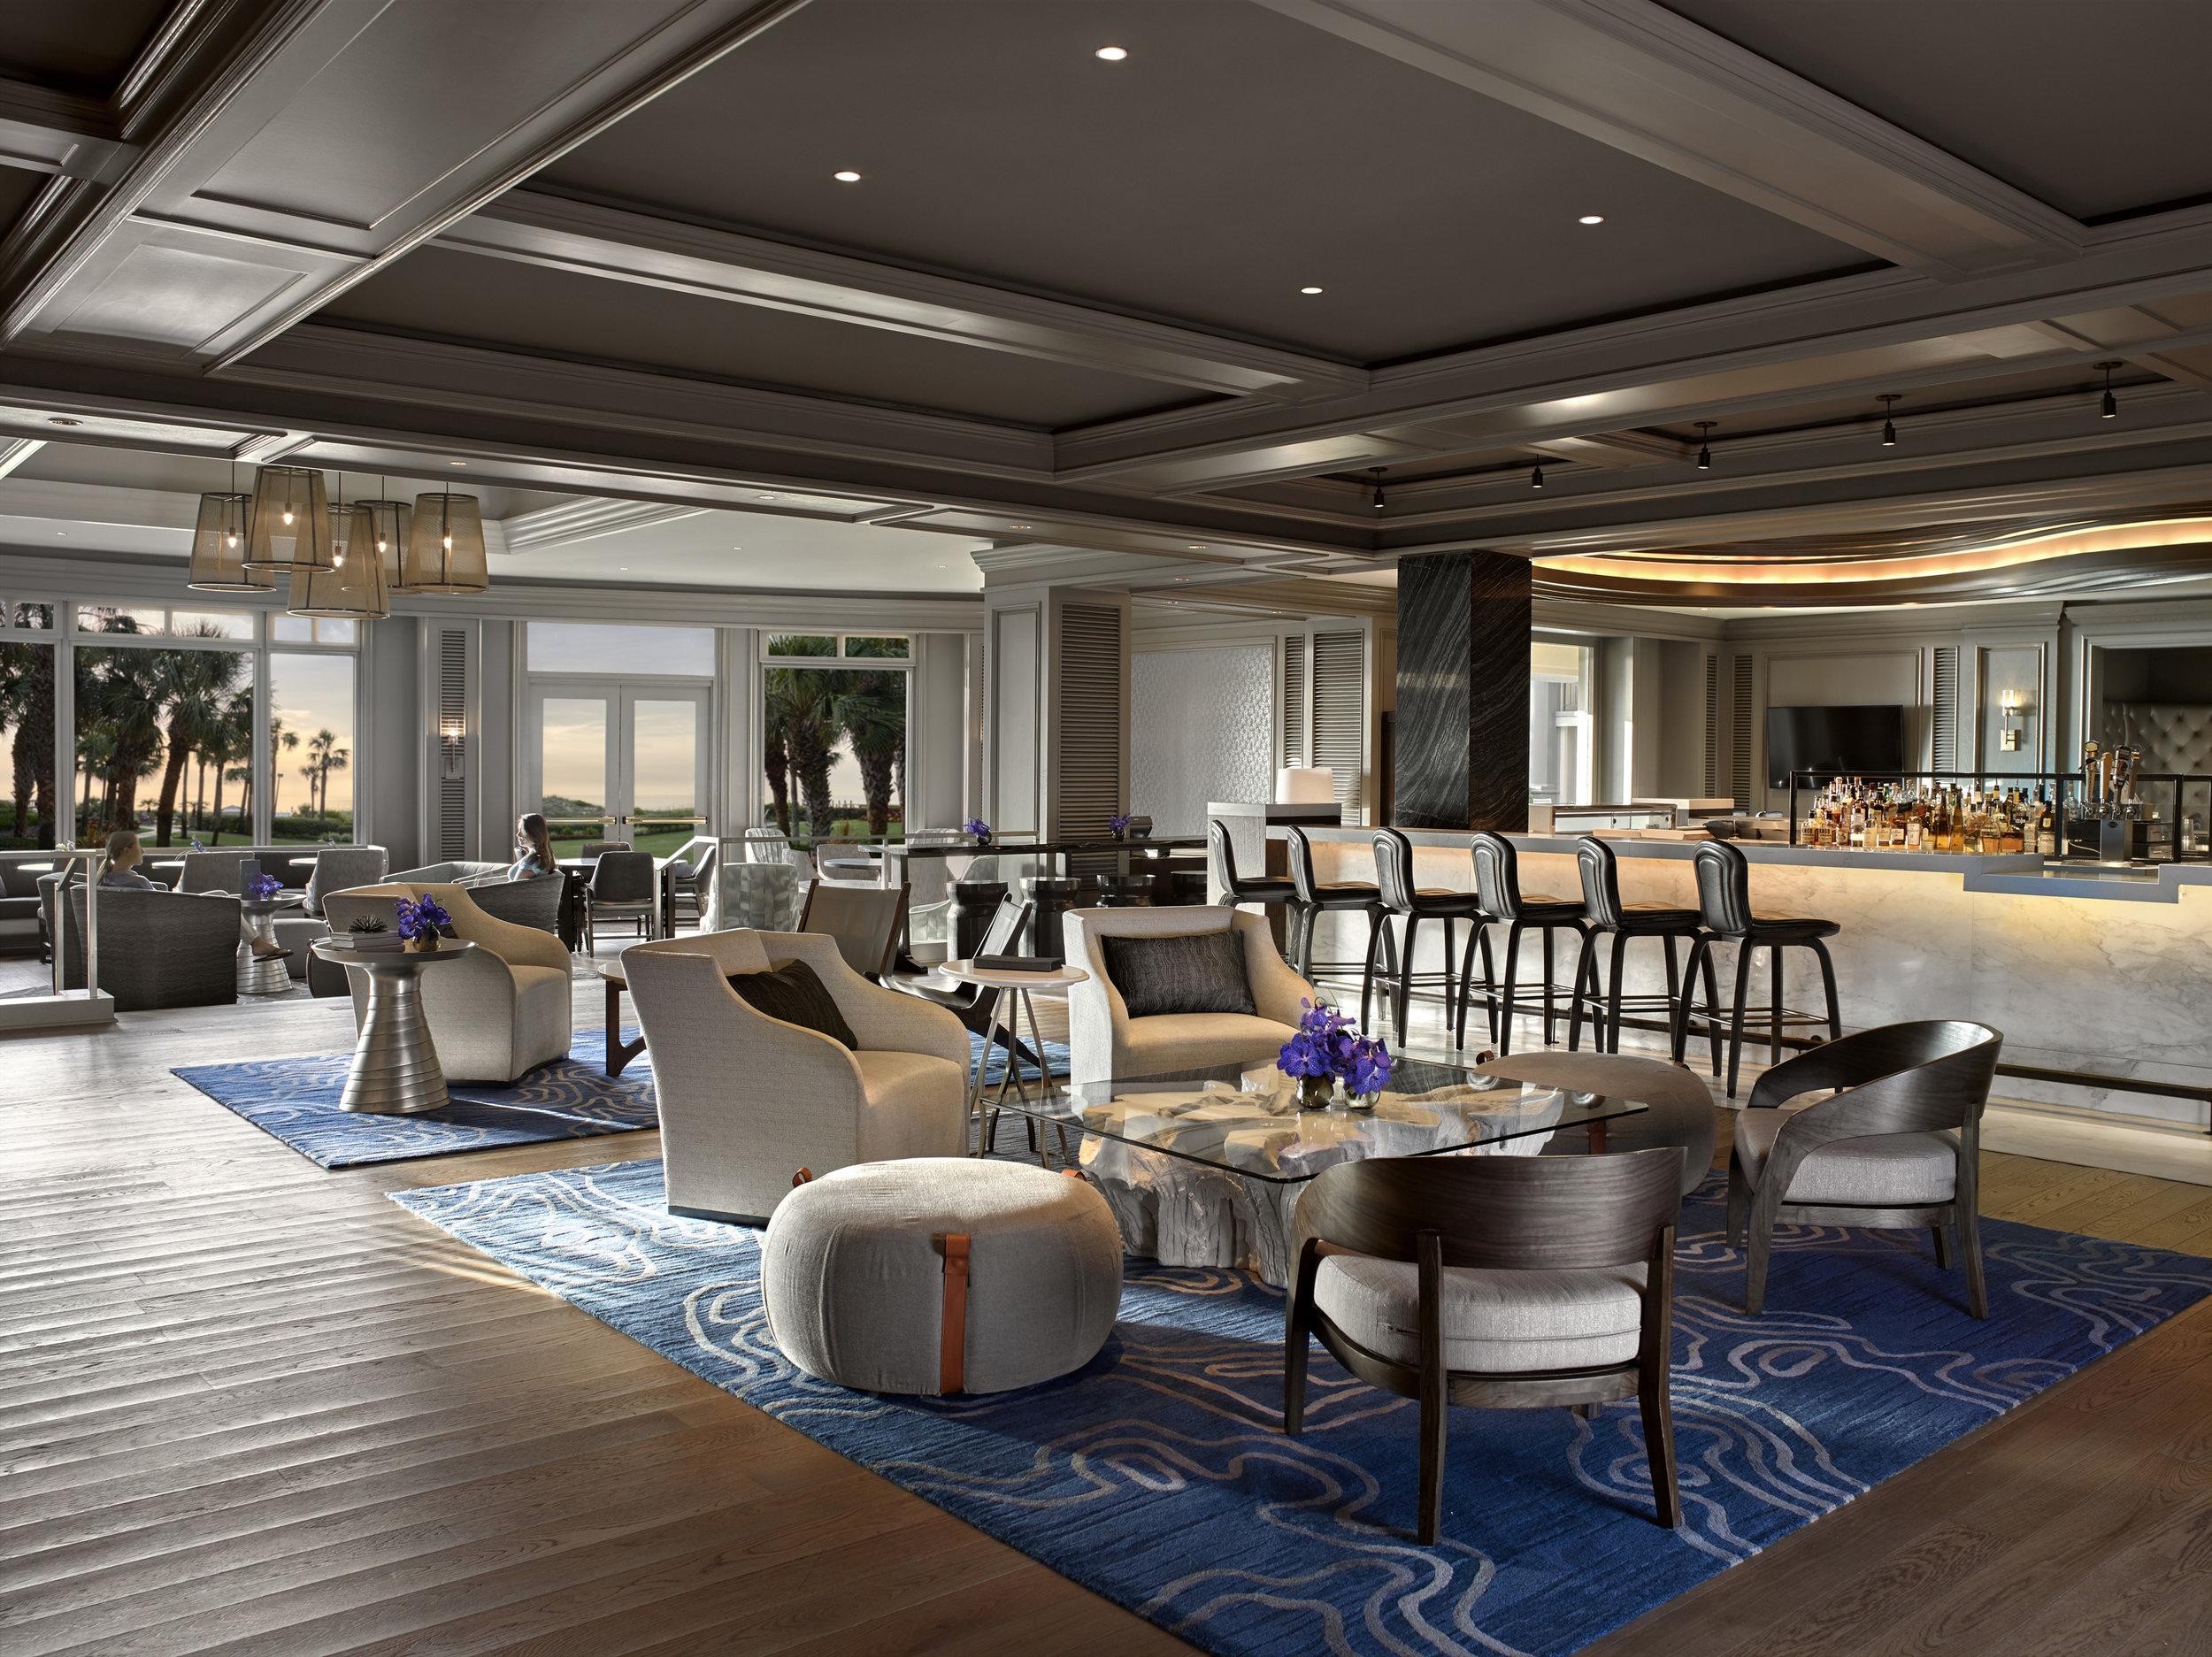 Ritz-Carlton-Amelia-Island-Shot-34-Option-1-LR.jpg